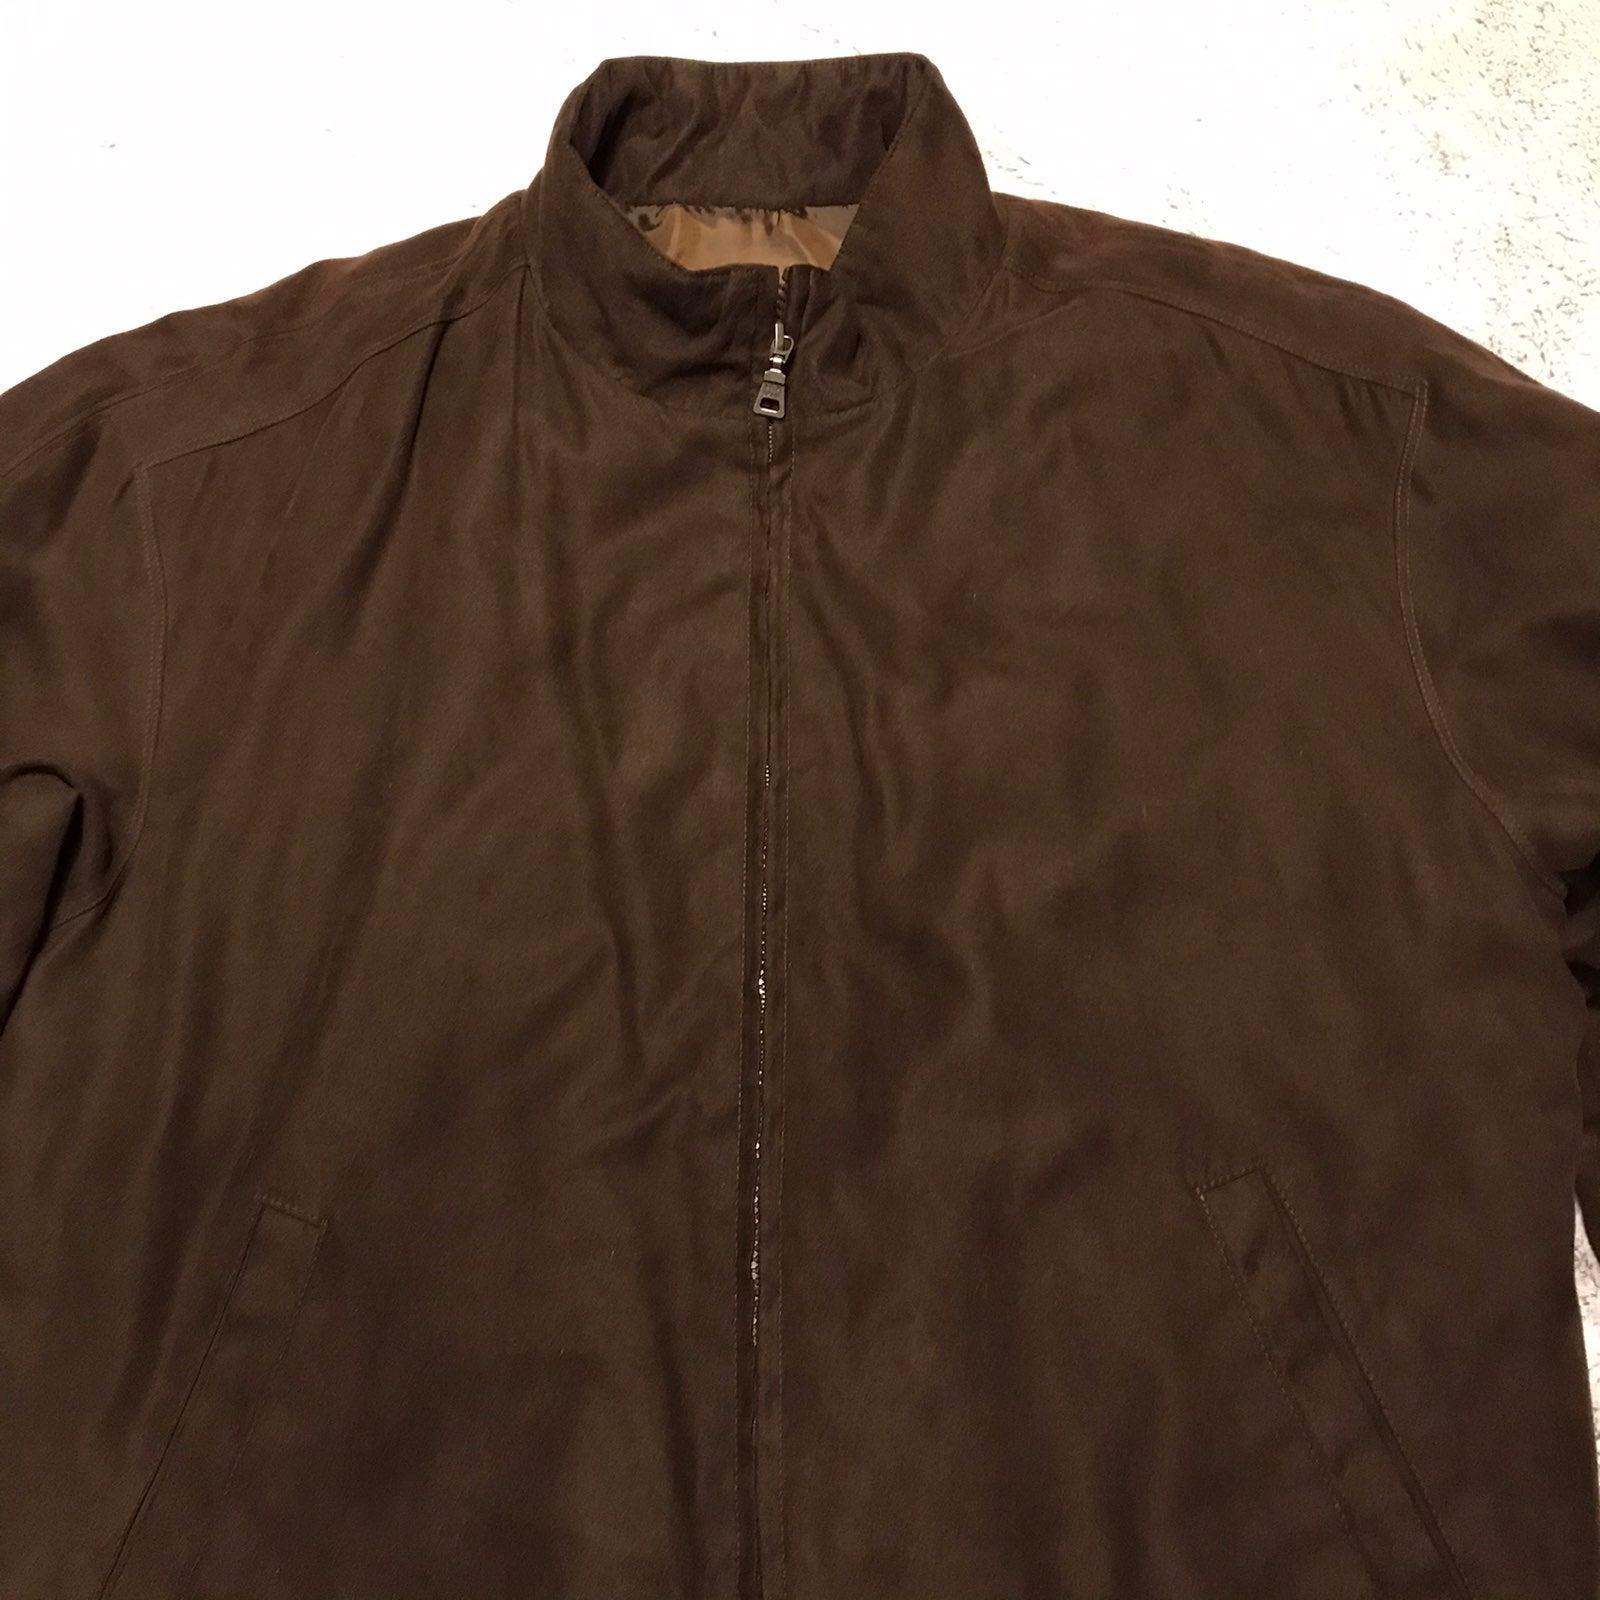 Jos. A. Bank Men's Microfiber Jacket, M